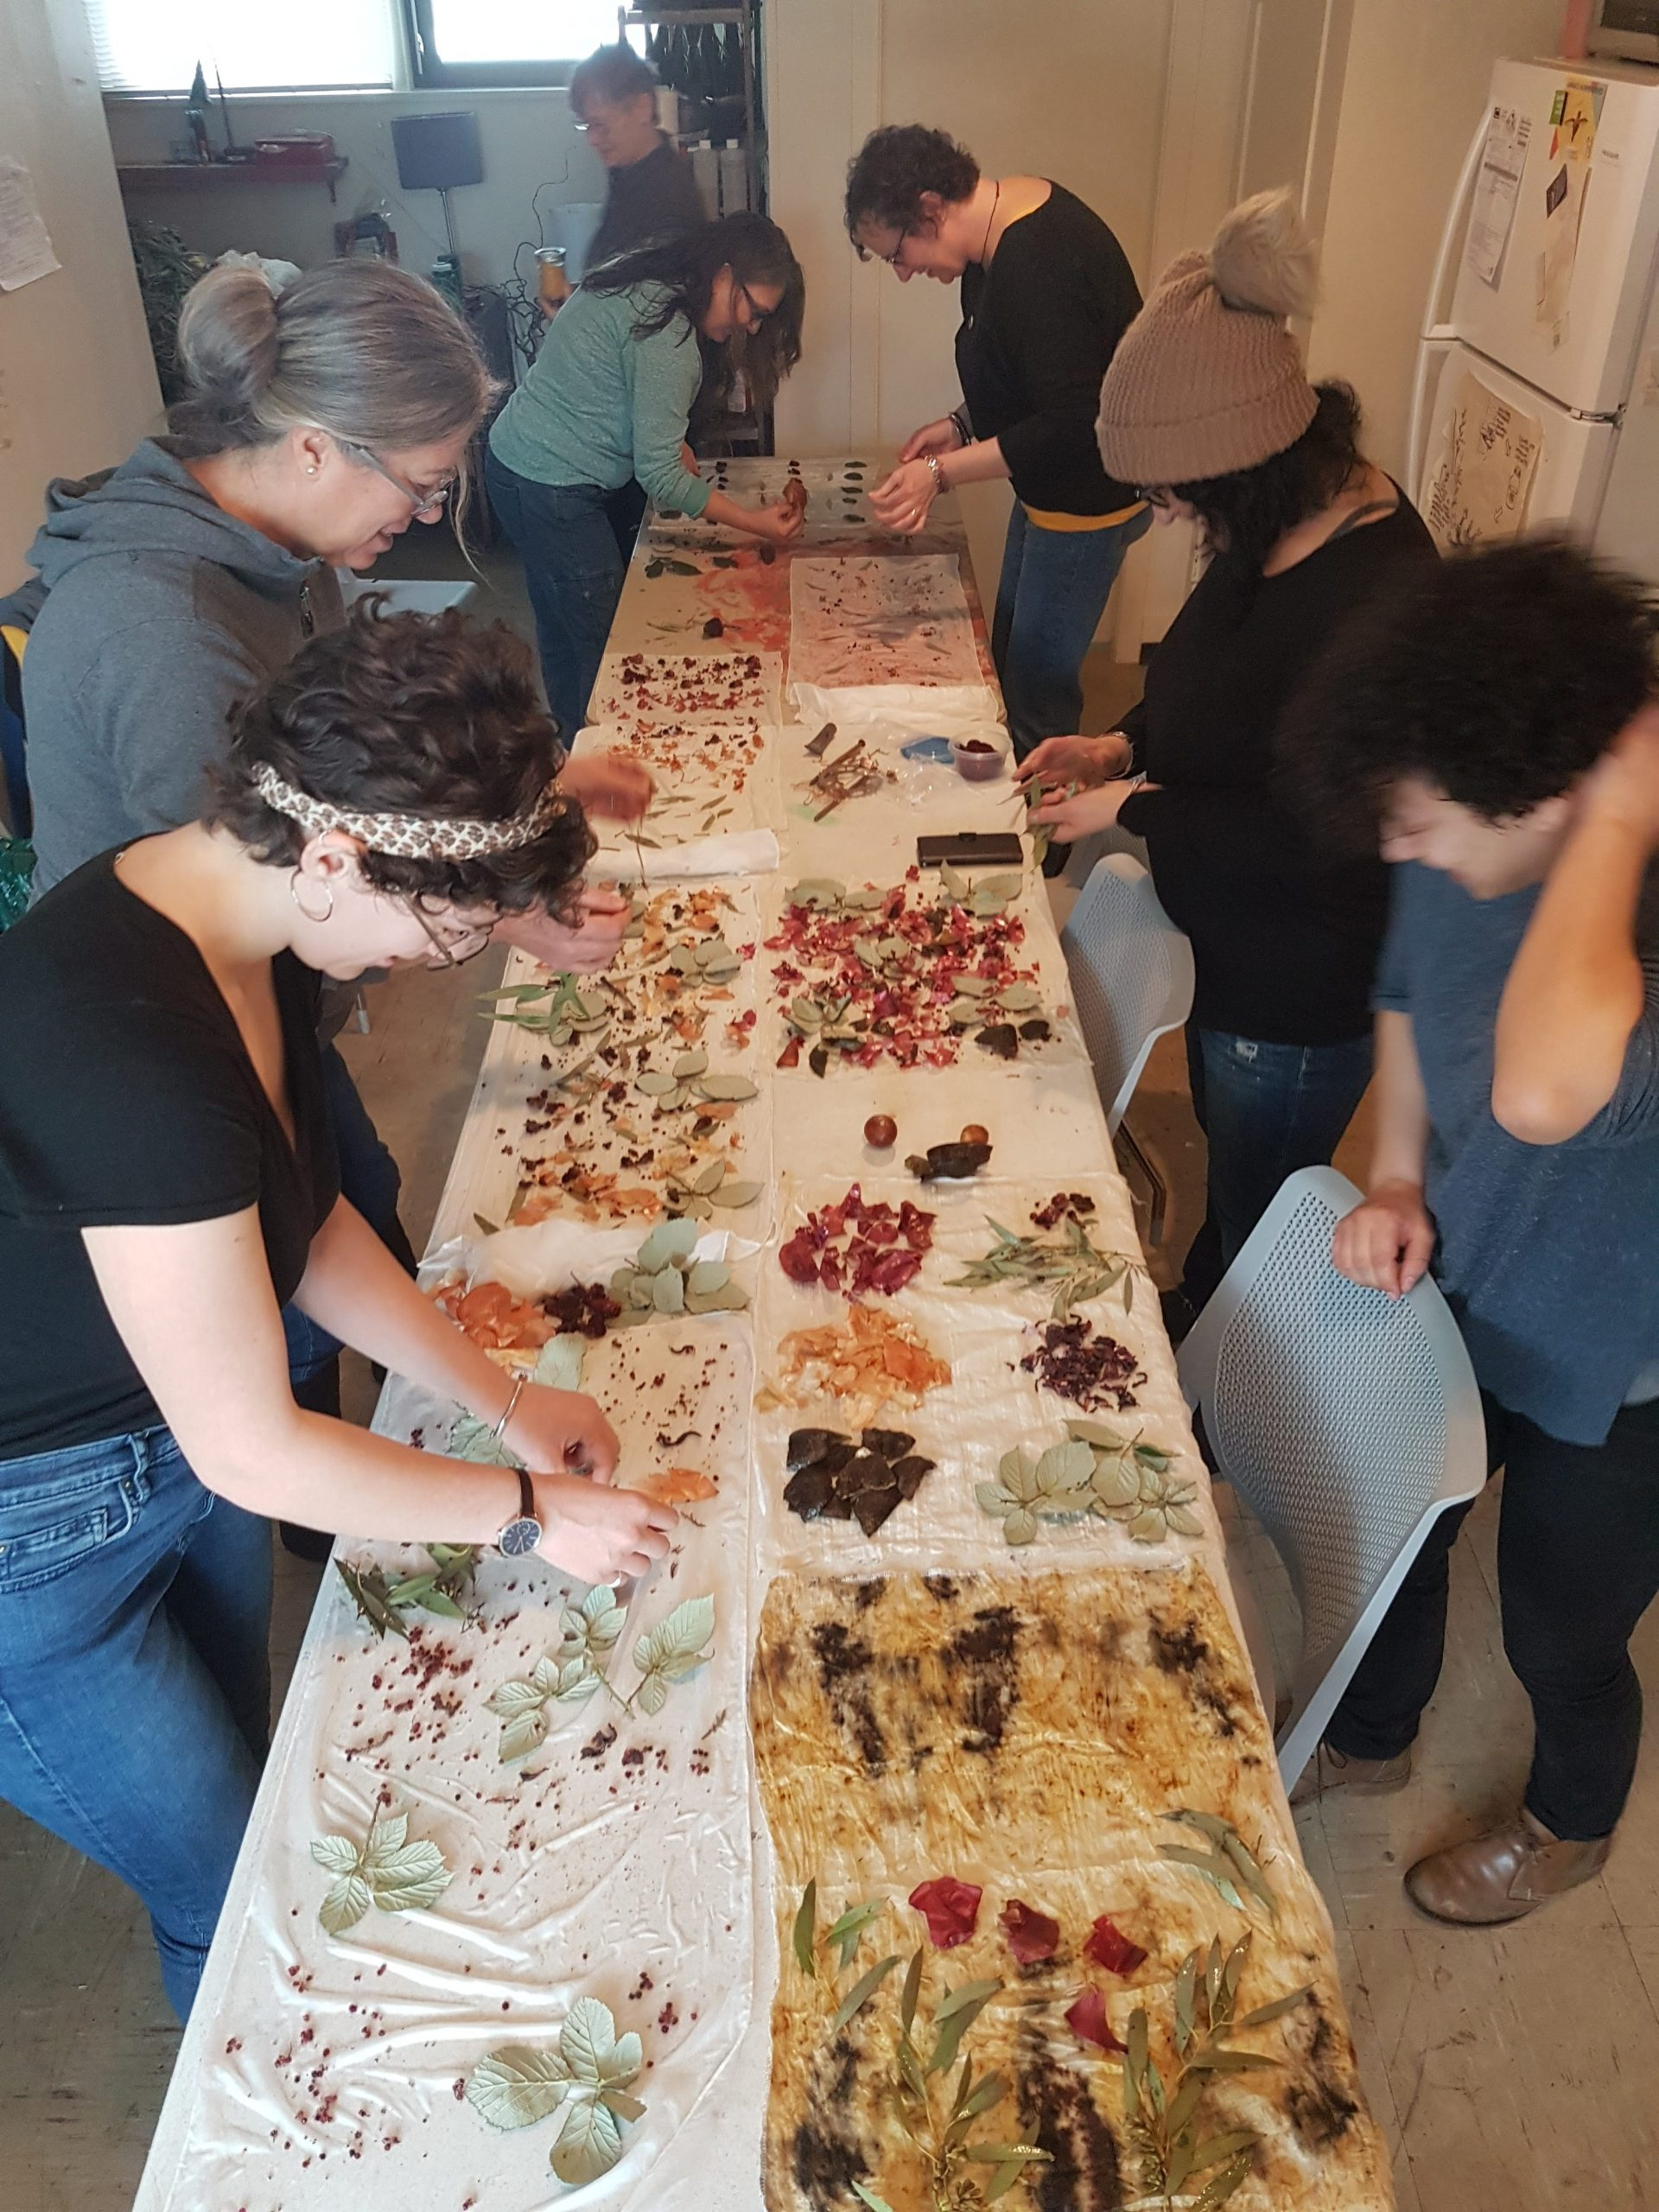 Bundle Dye Workshop (Feb 2019) - Photo by Bea Miller